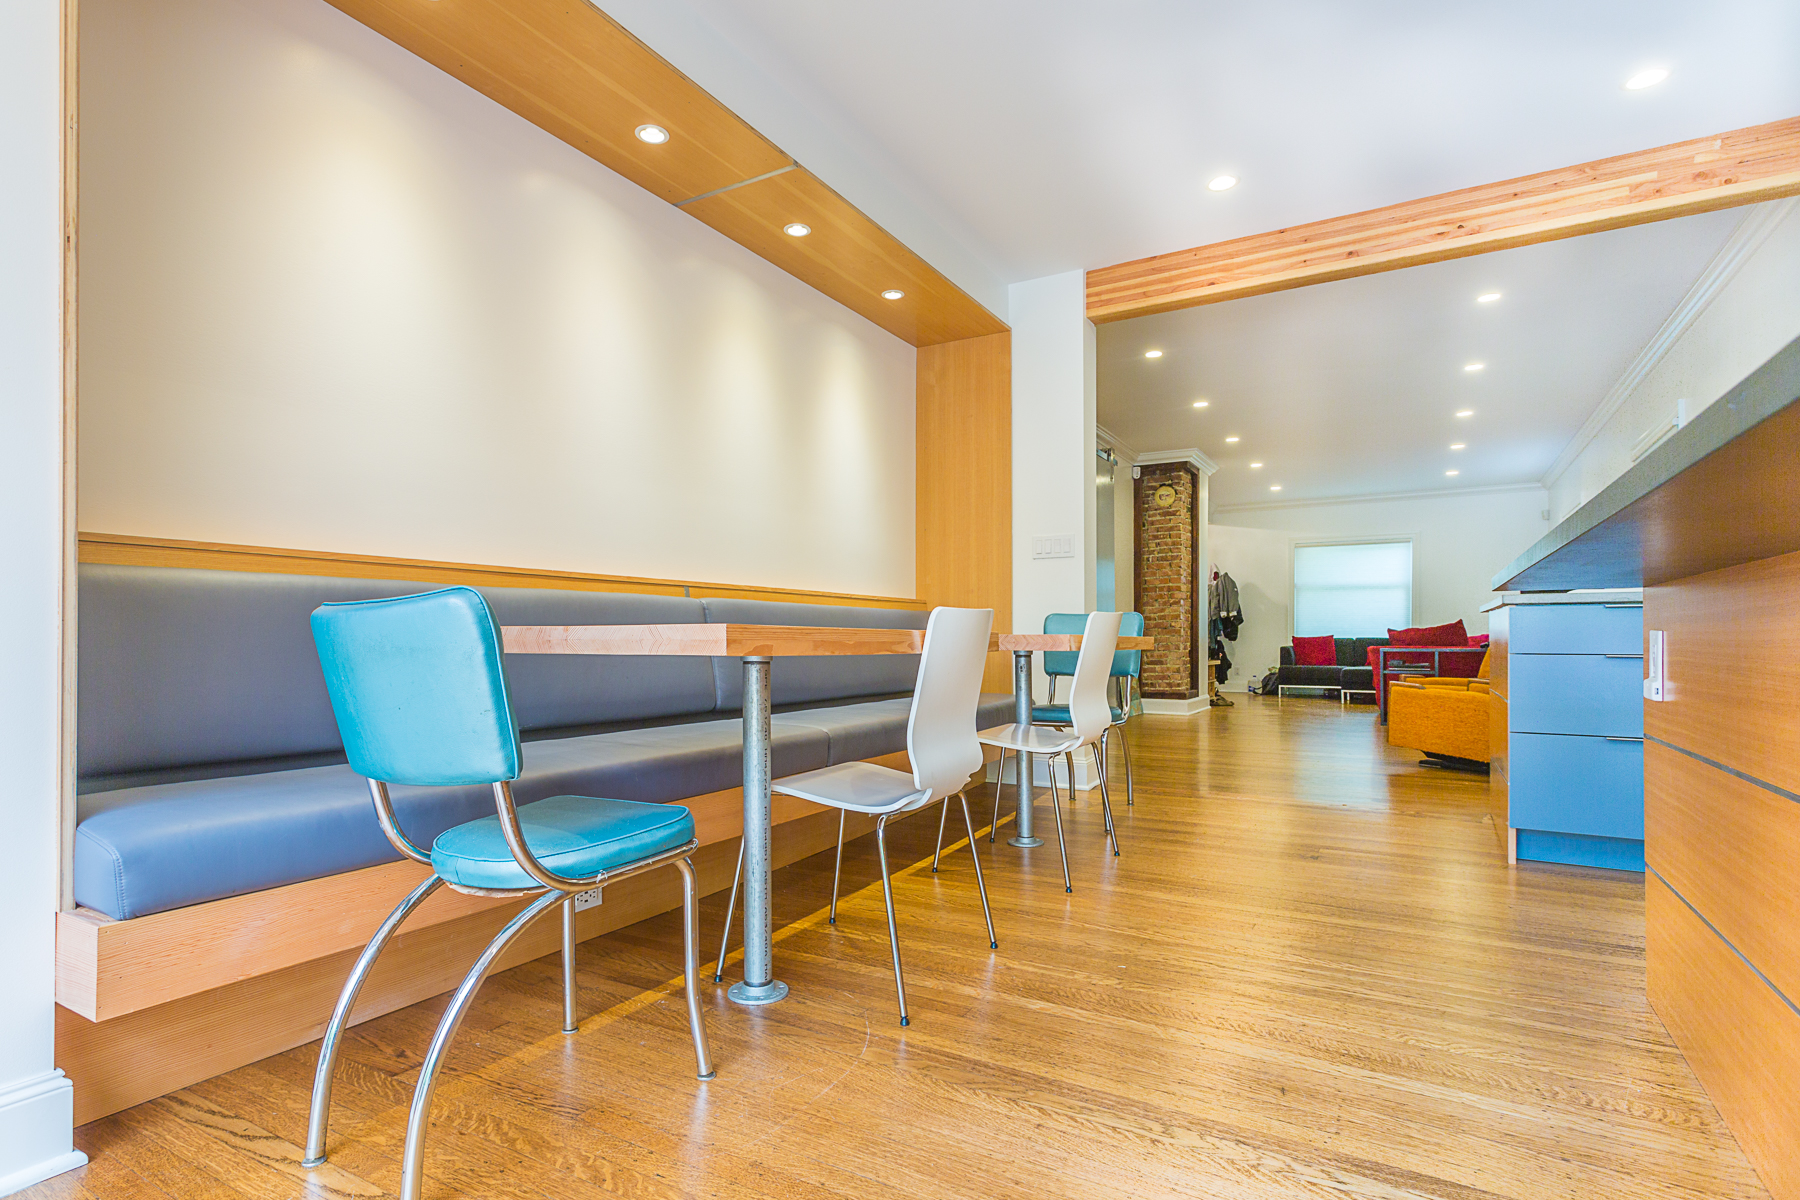 Harka Architecture_Stevens Home Remodel (6) - Built-in kitchen bench.jpg